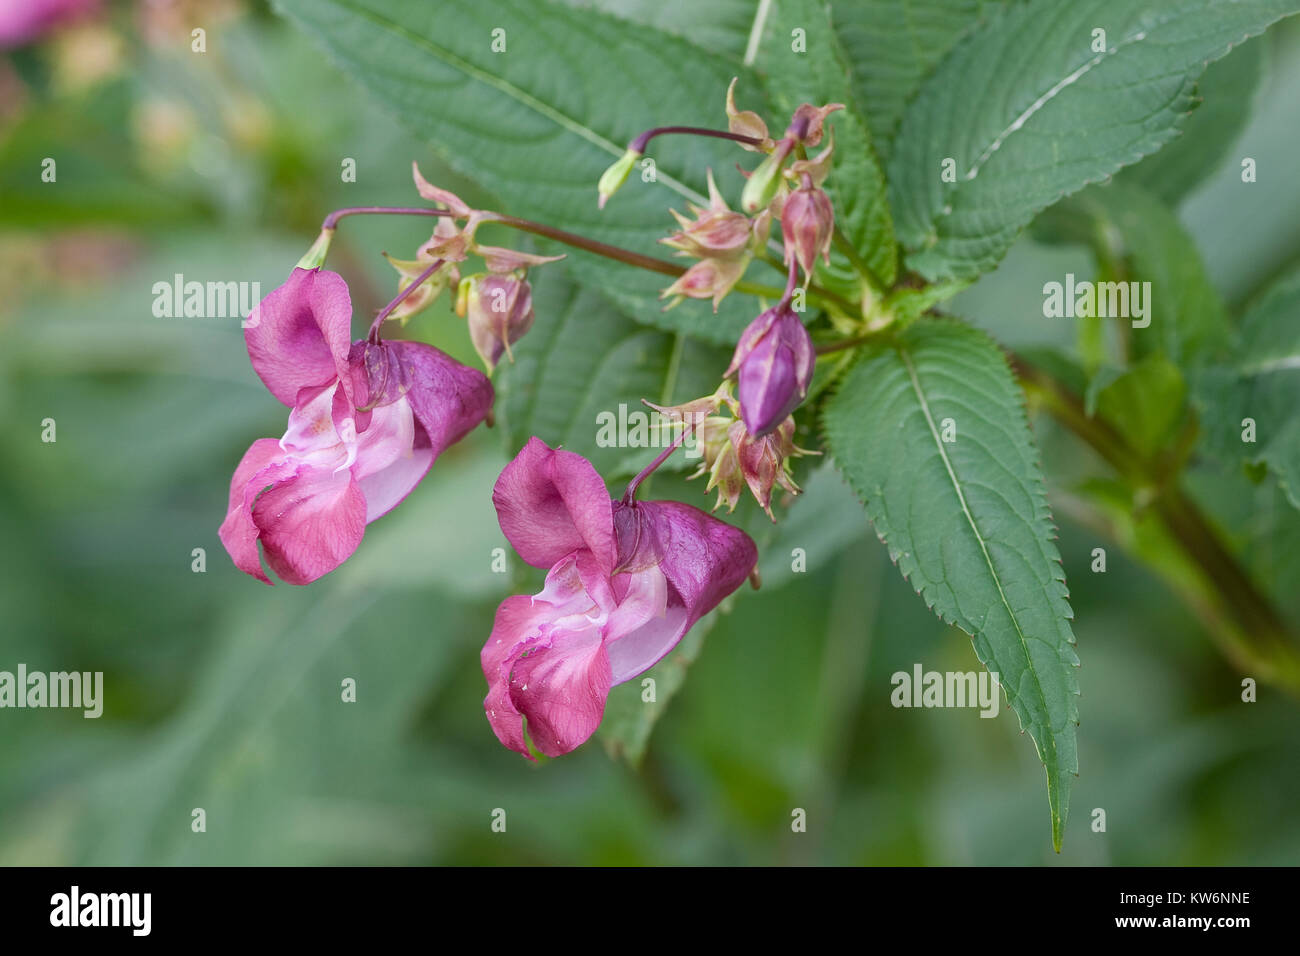 Indisches Springkraut, Drüsiges Springkraut, Impatiens glandulifera, Himalayan Balsam, Policeman`s Helmet Stock Photo